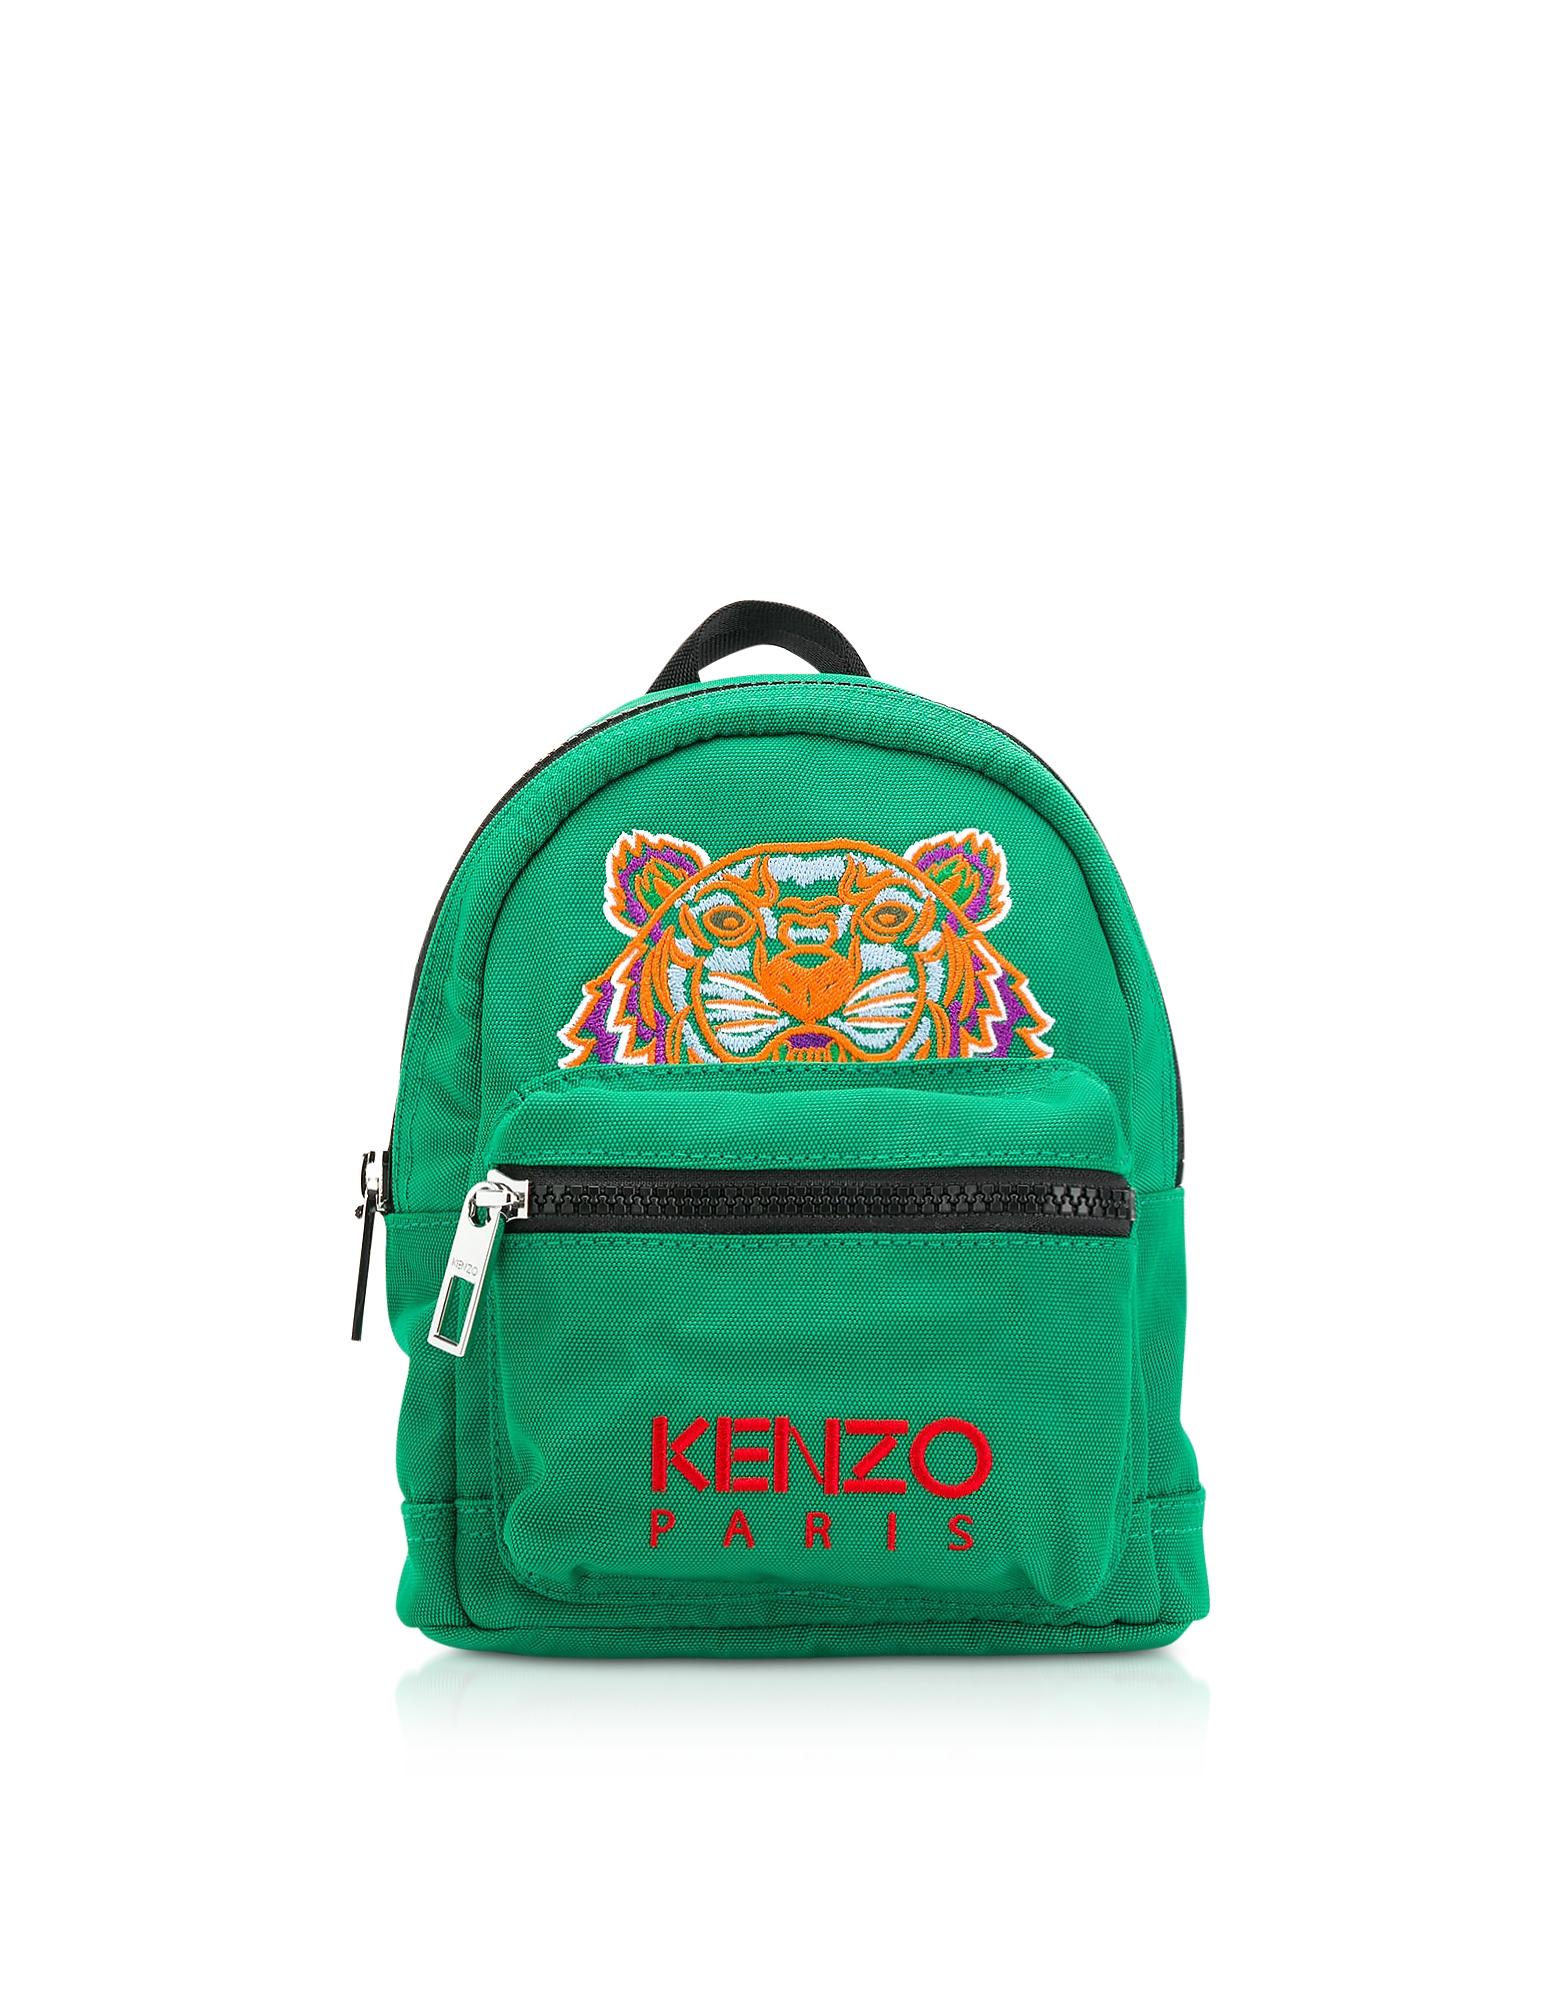 Kenzo Handbags, Grass Green Canvas Mini Tiger Backpack